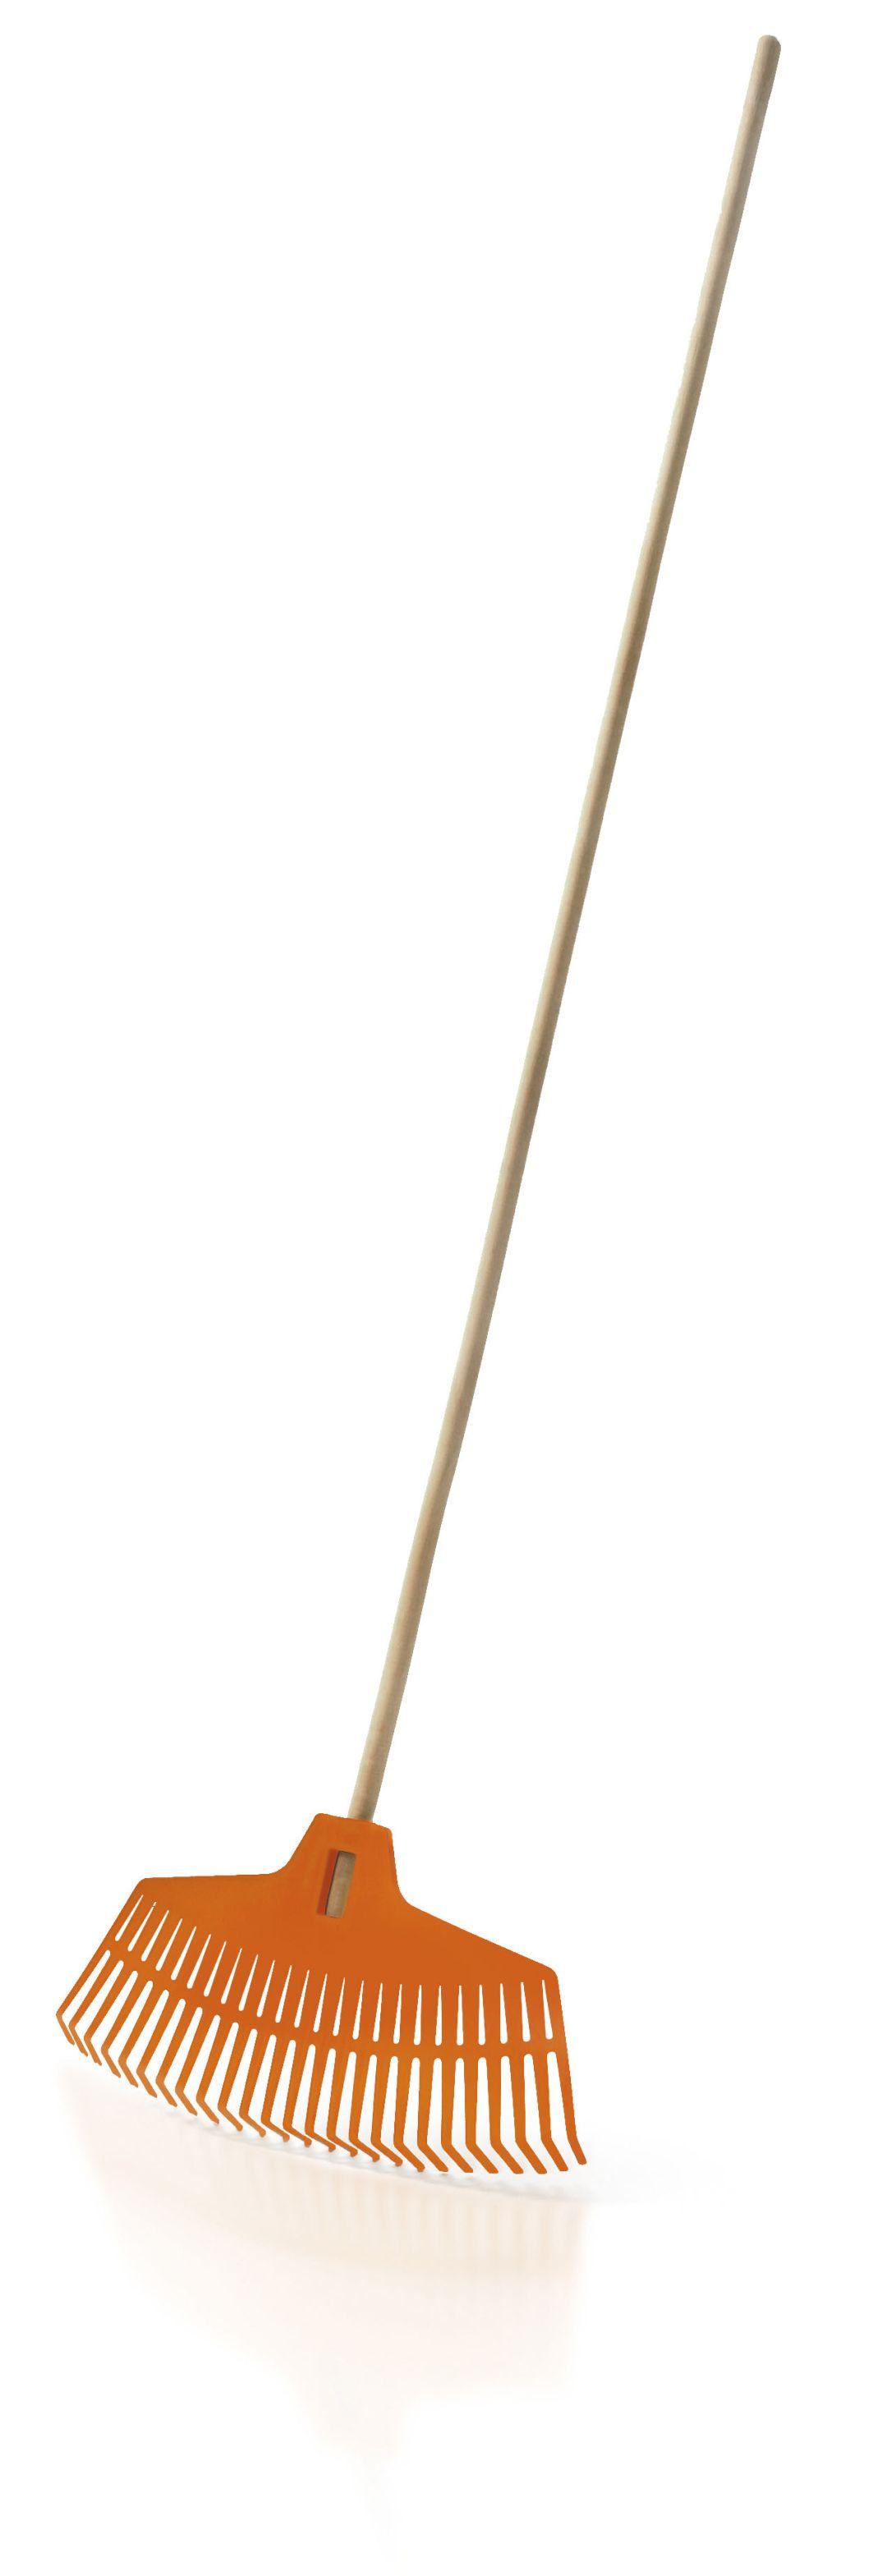 PROSPERPLAST Hrábě FOCUS oranžové, dřevěná násada 165cm